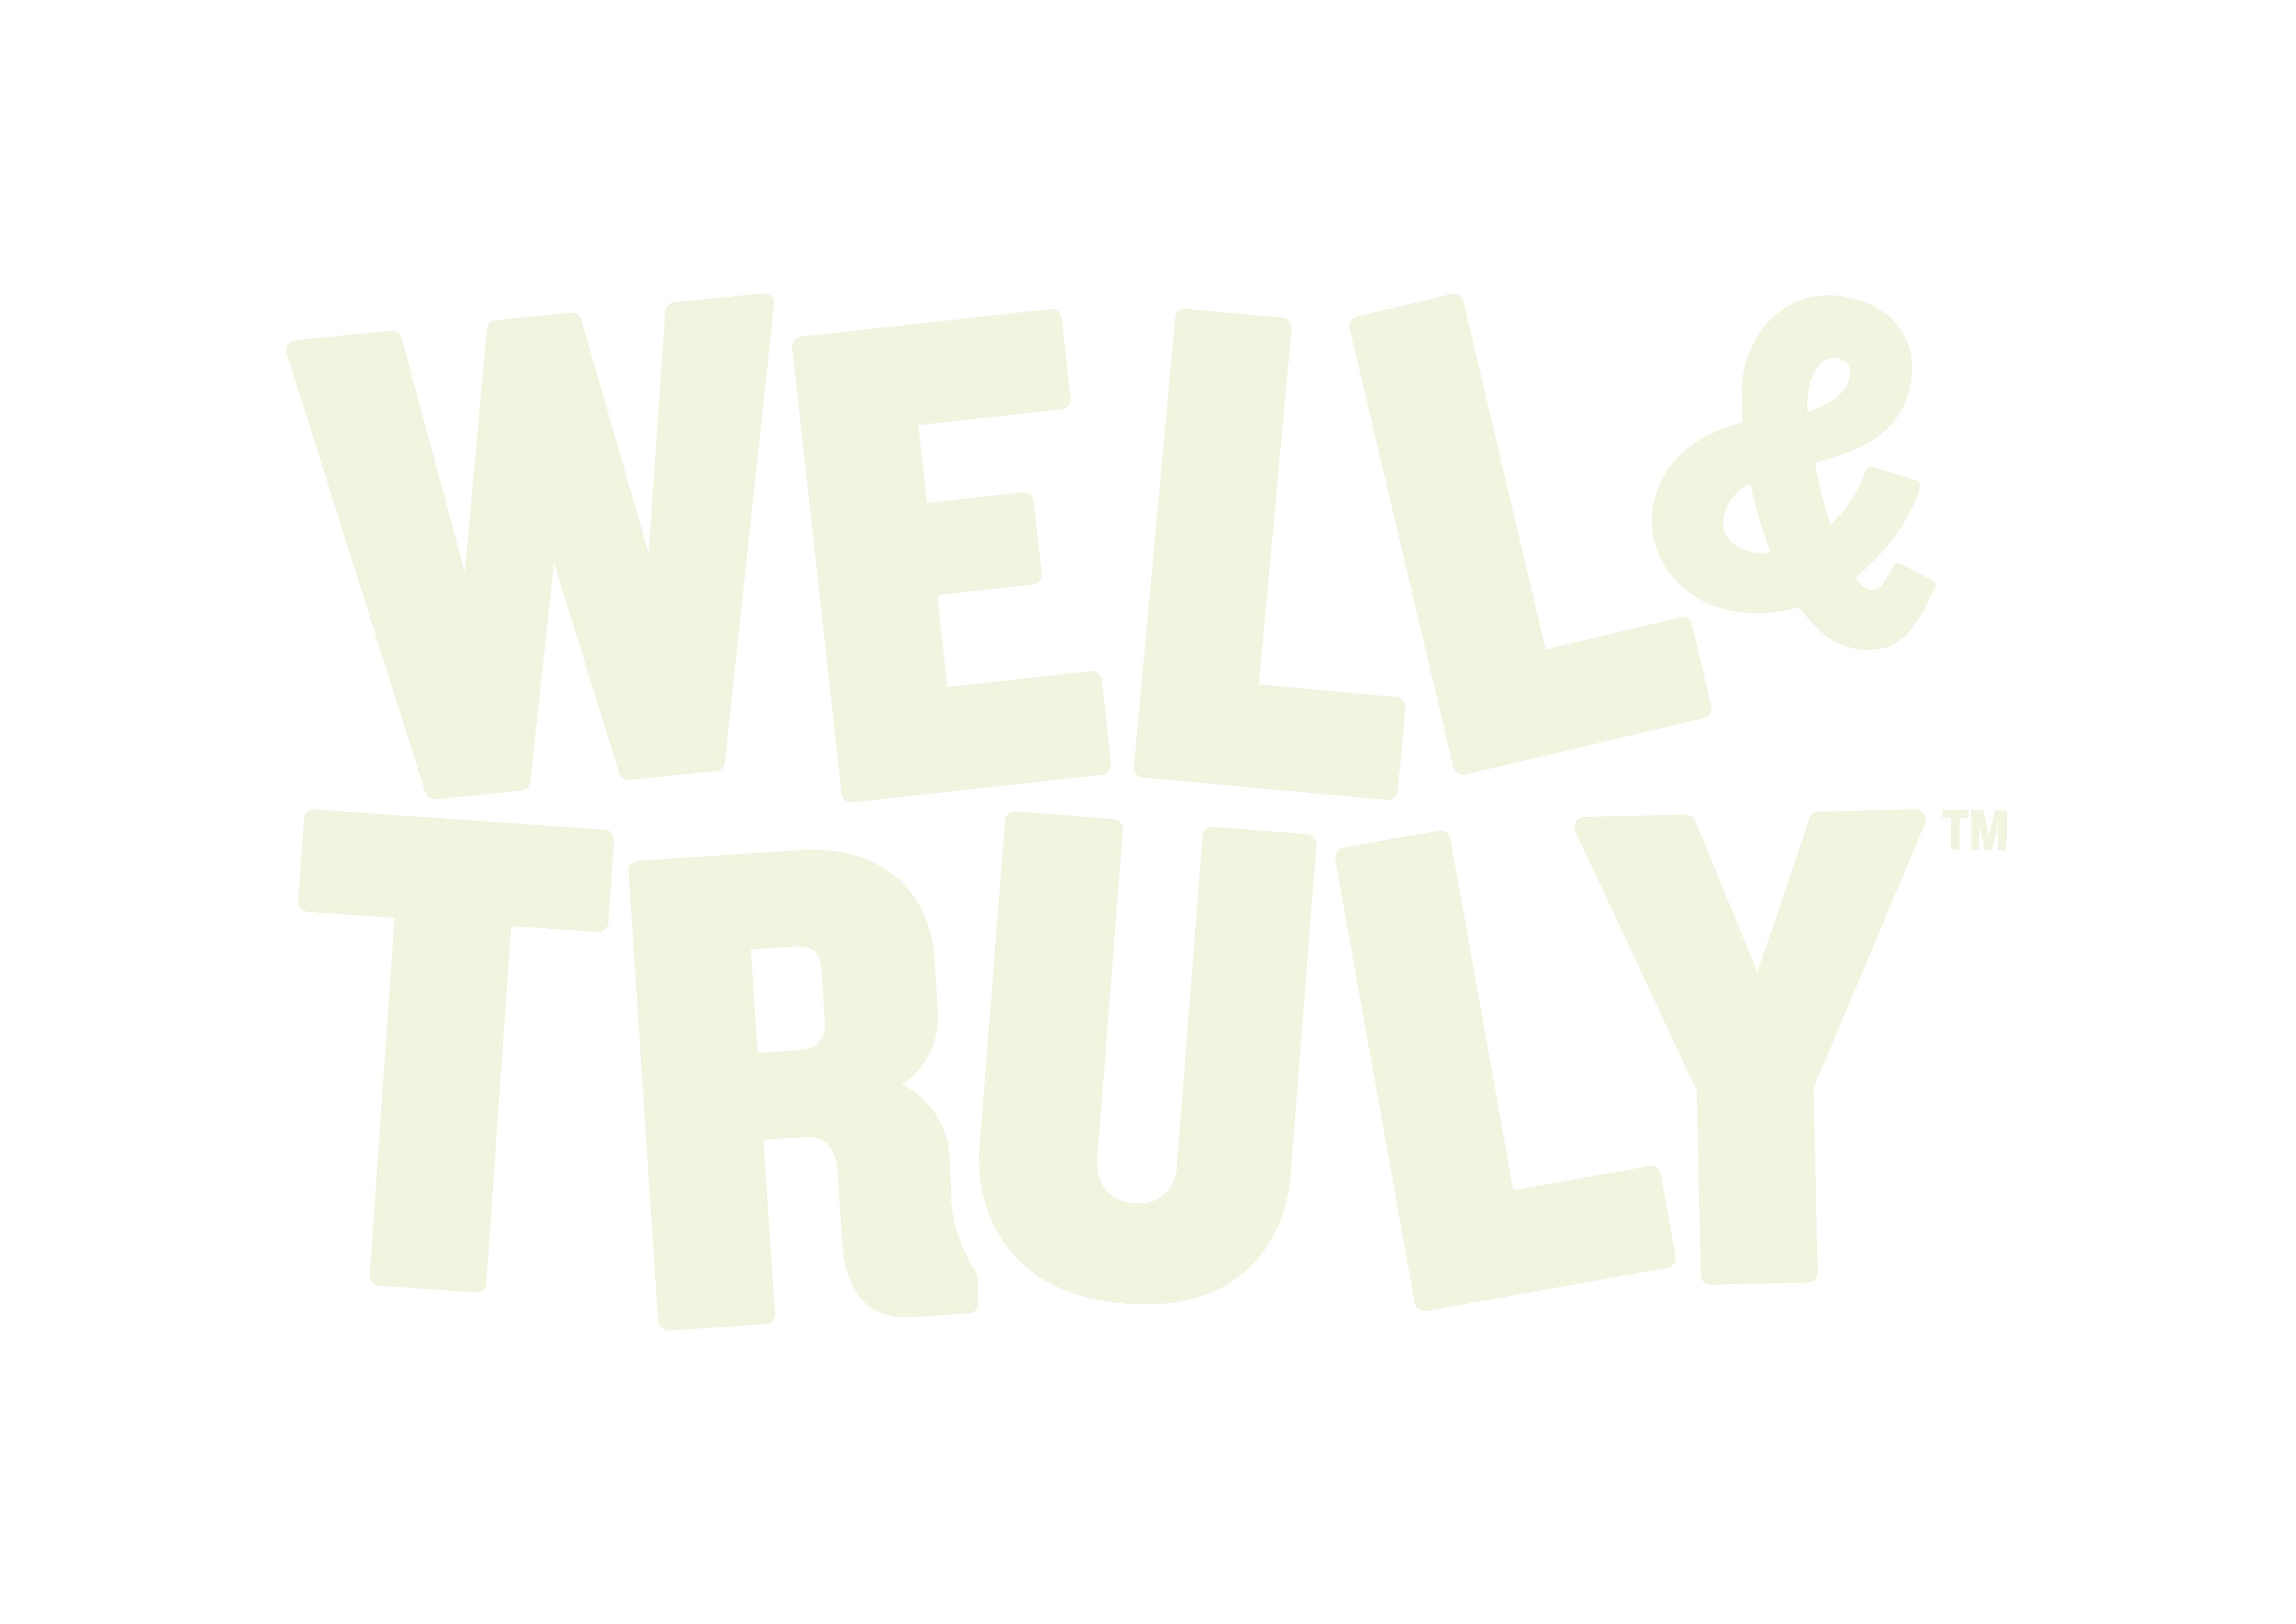 Well & Truly company logo